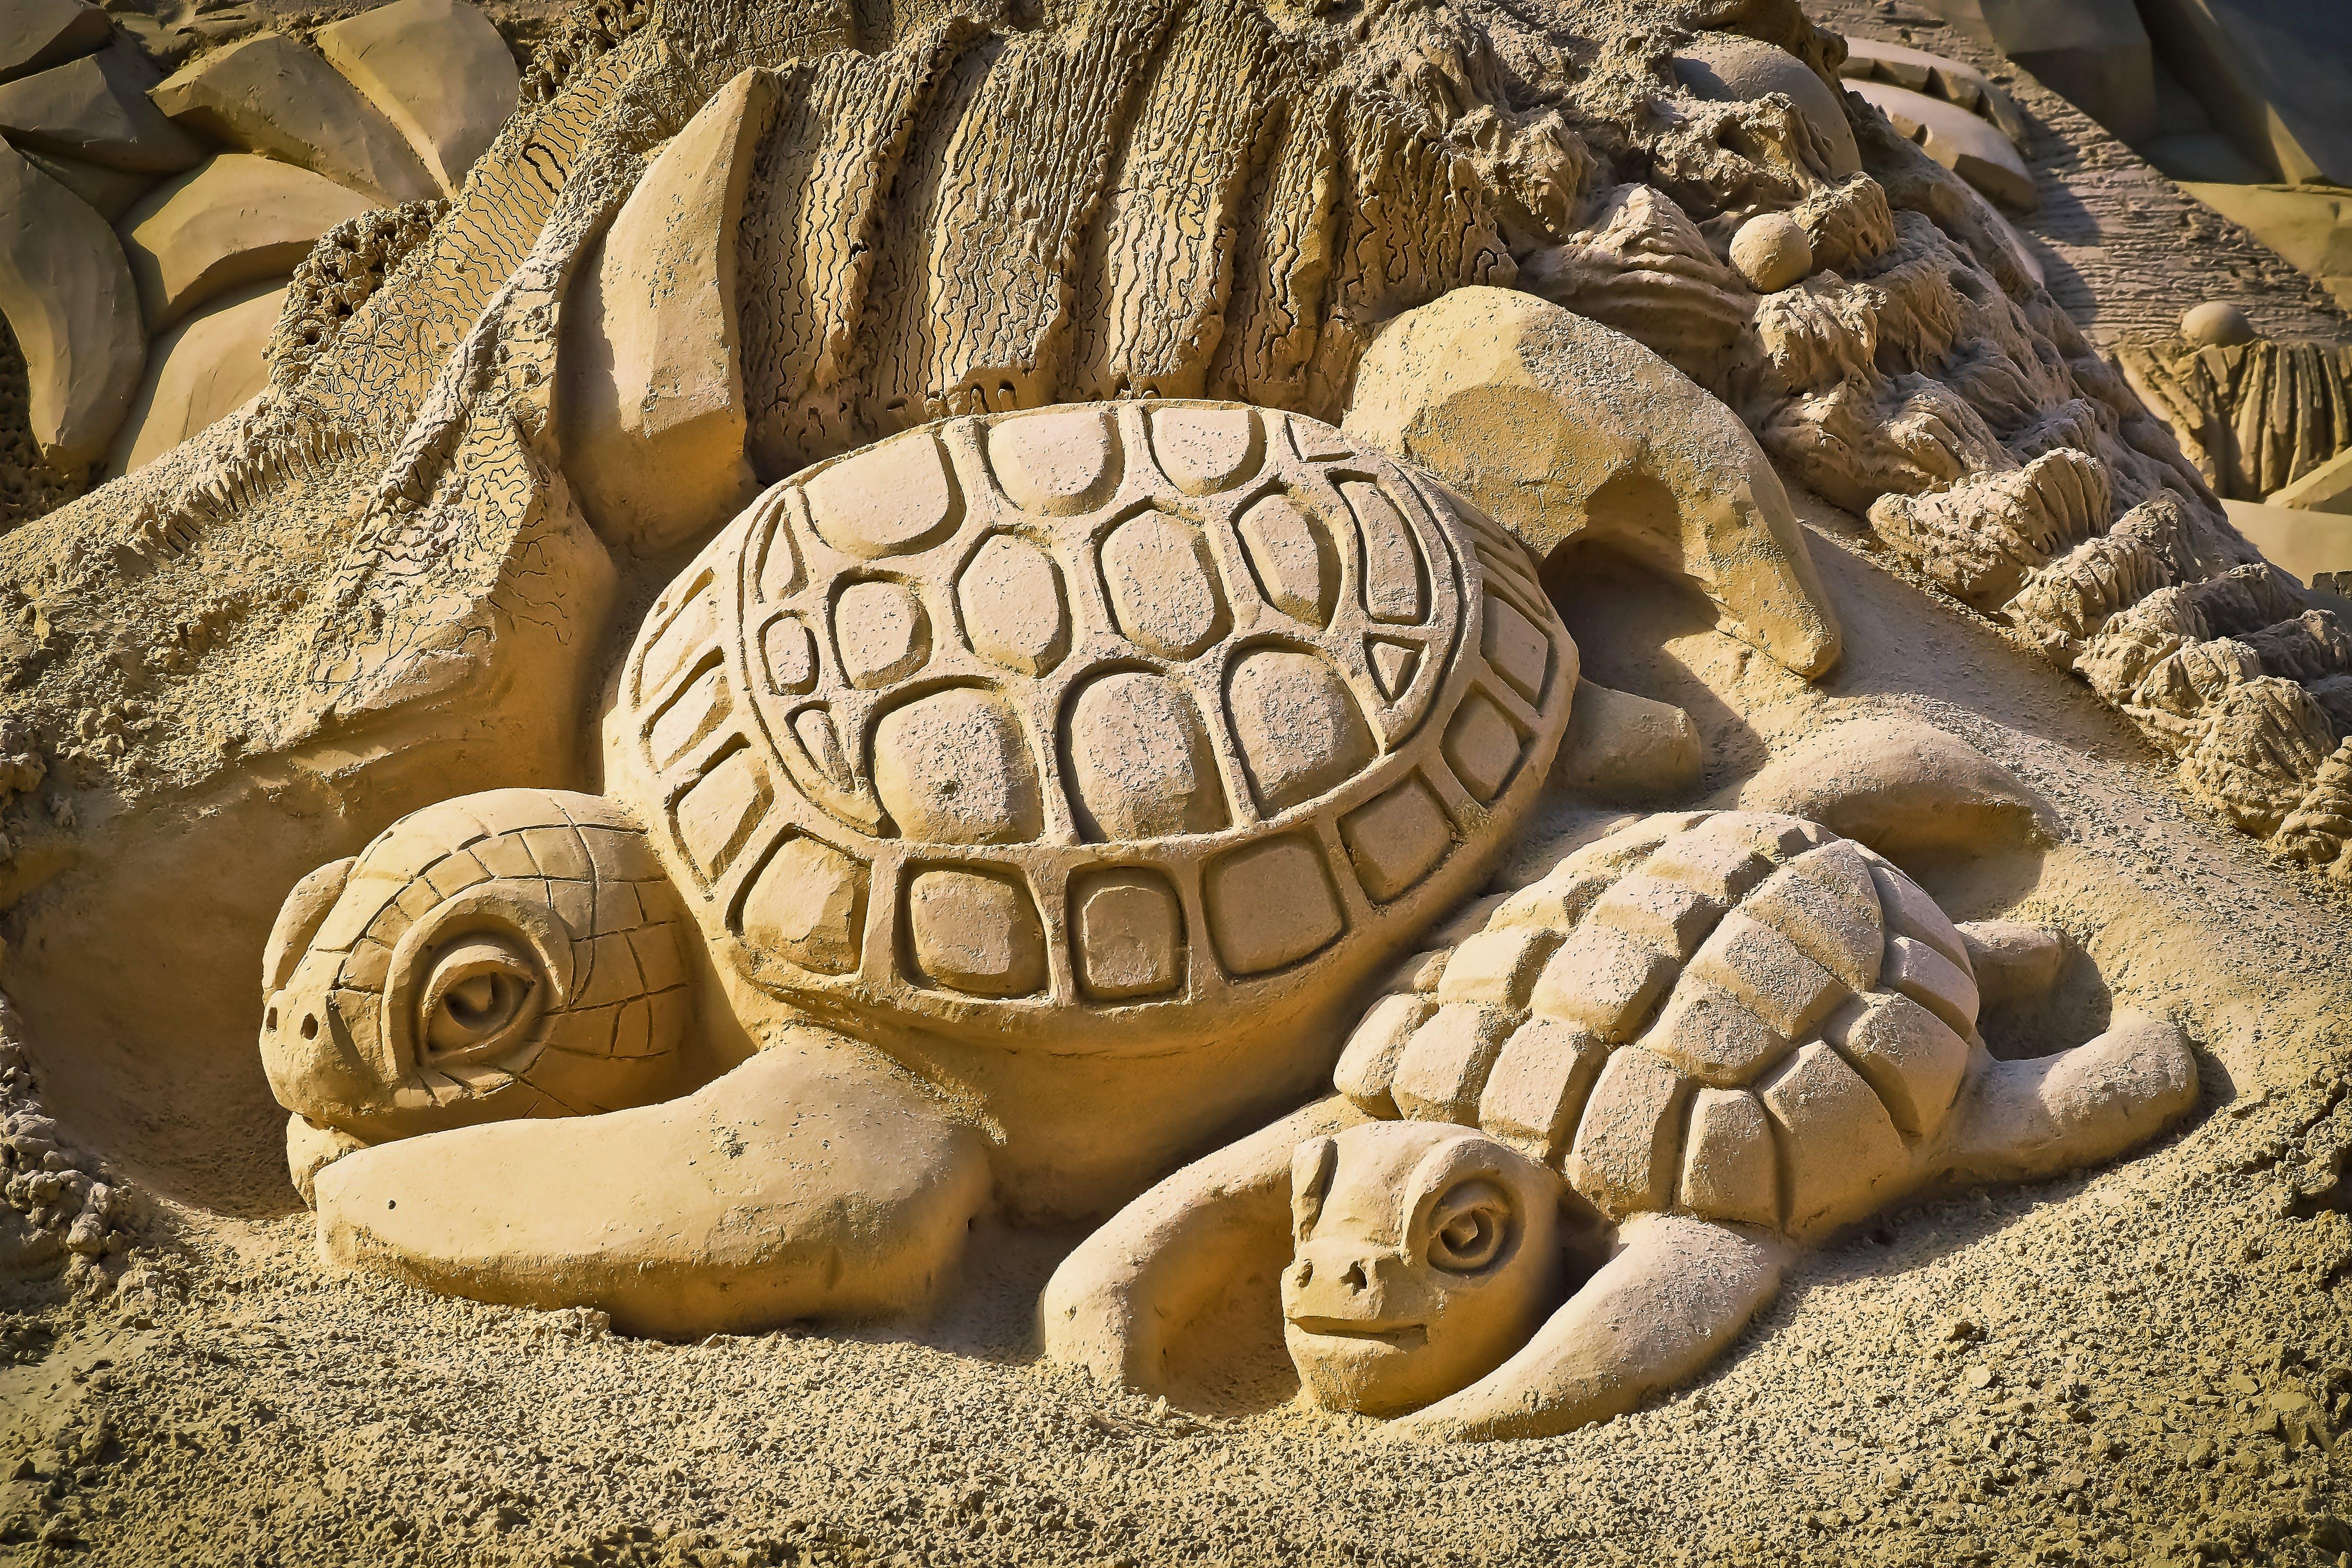 Turtle Sand Art Making